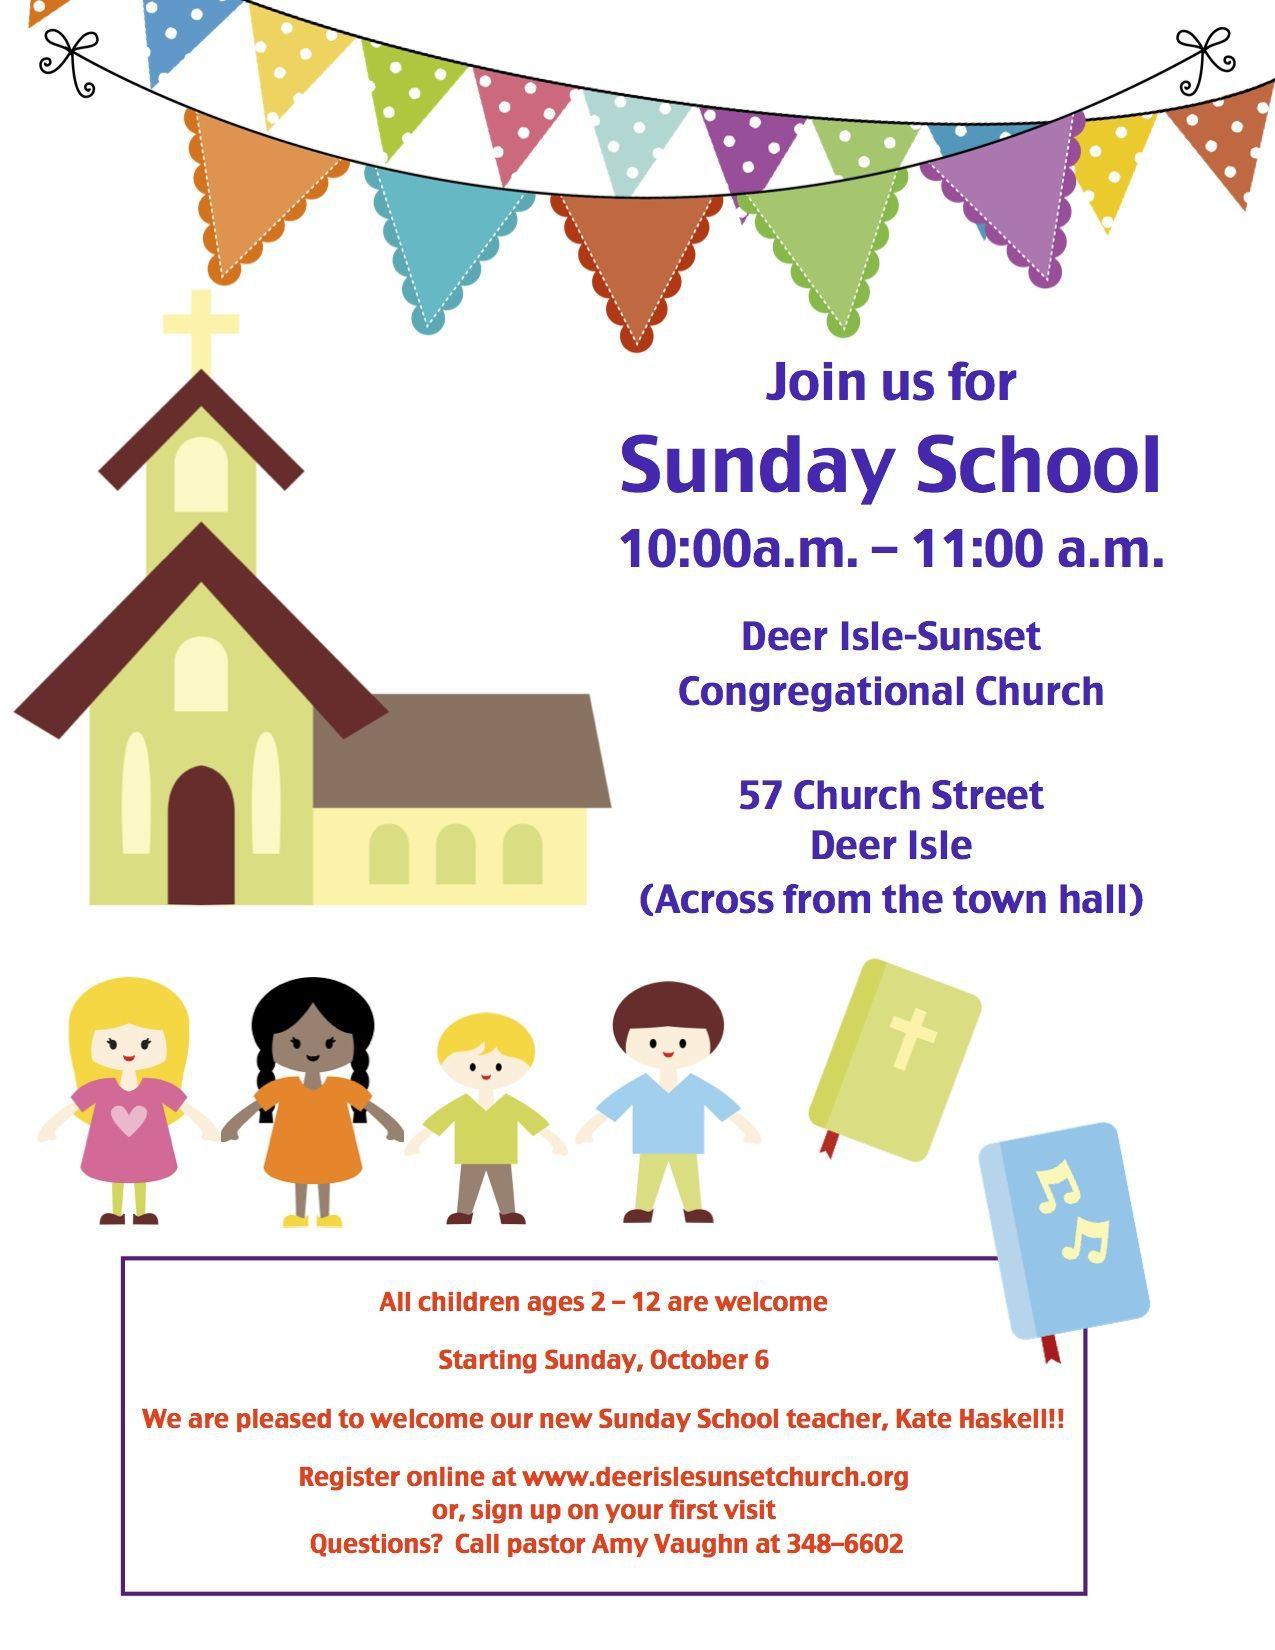 001 Unique Free Sunday School Flyer Template Photo  TemplatesFull